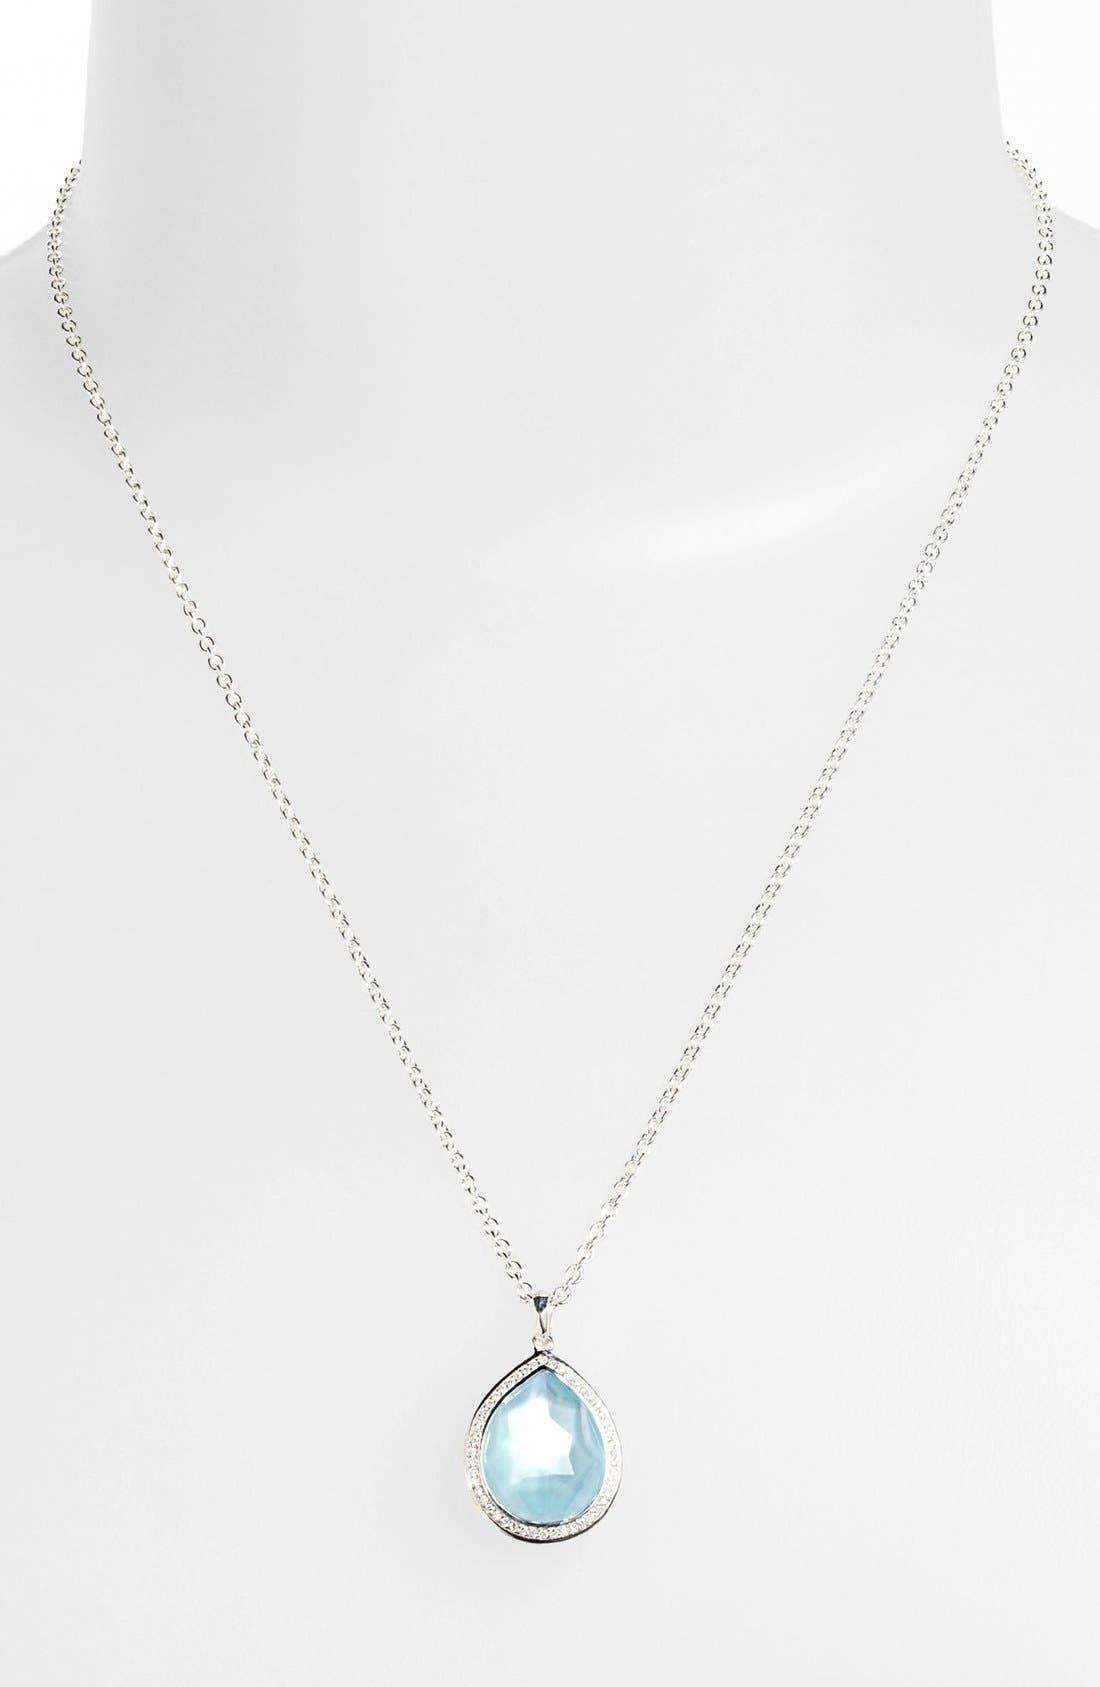 Ippolita 'Stella' Small Teardrop Pendant Necklace